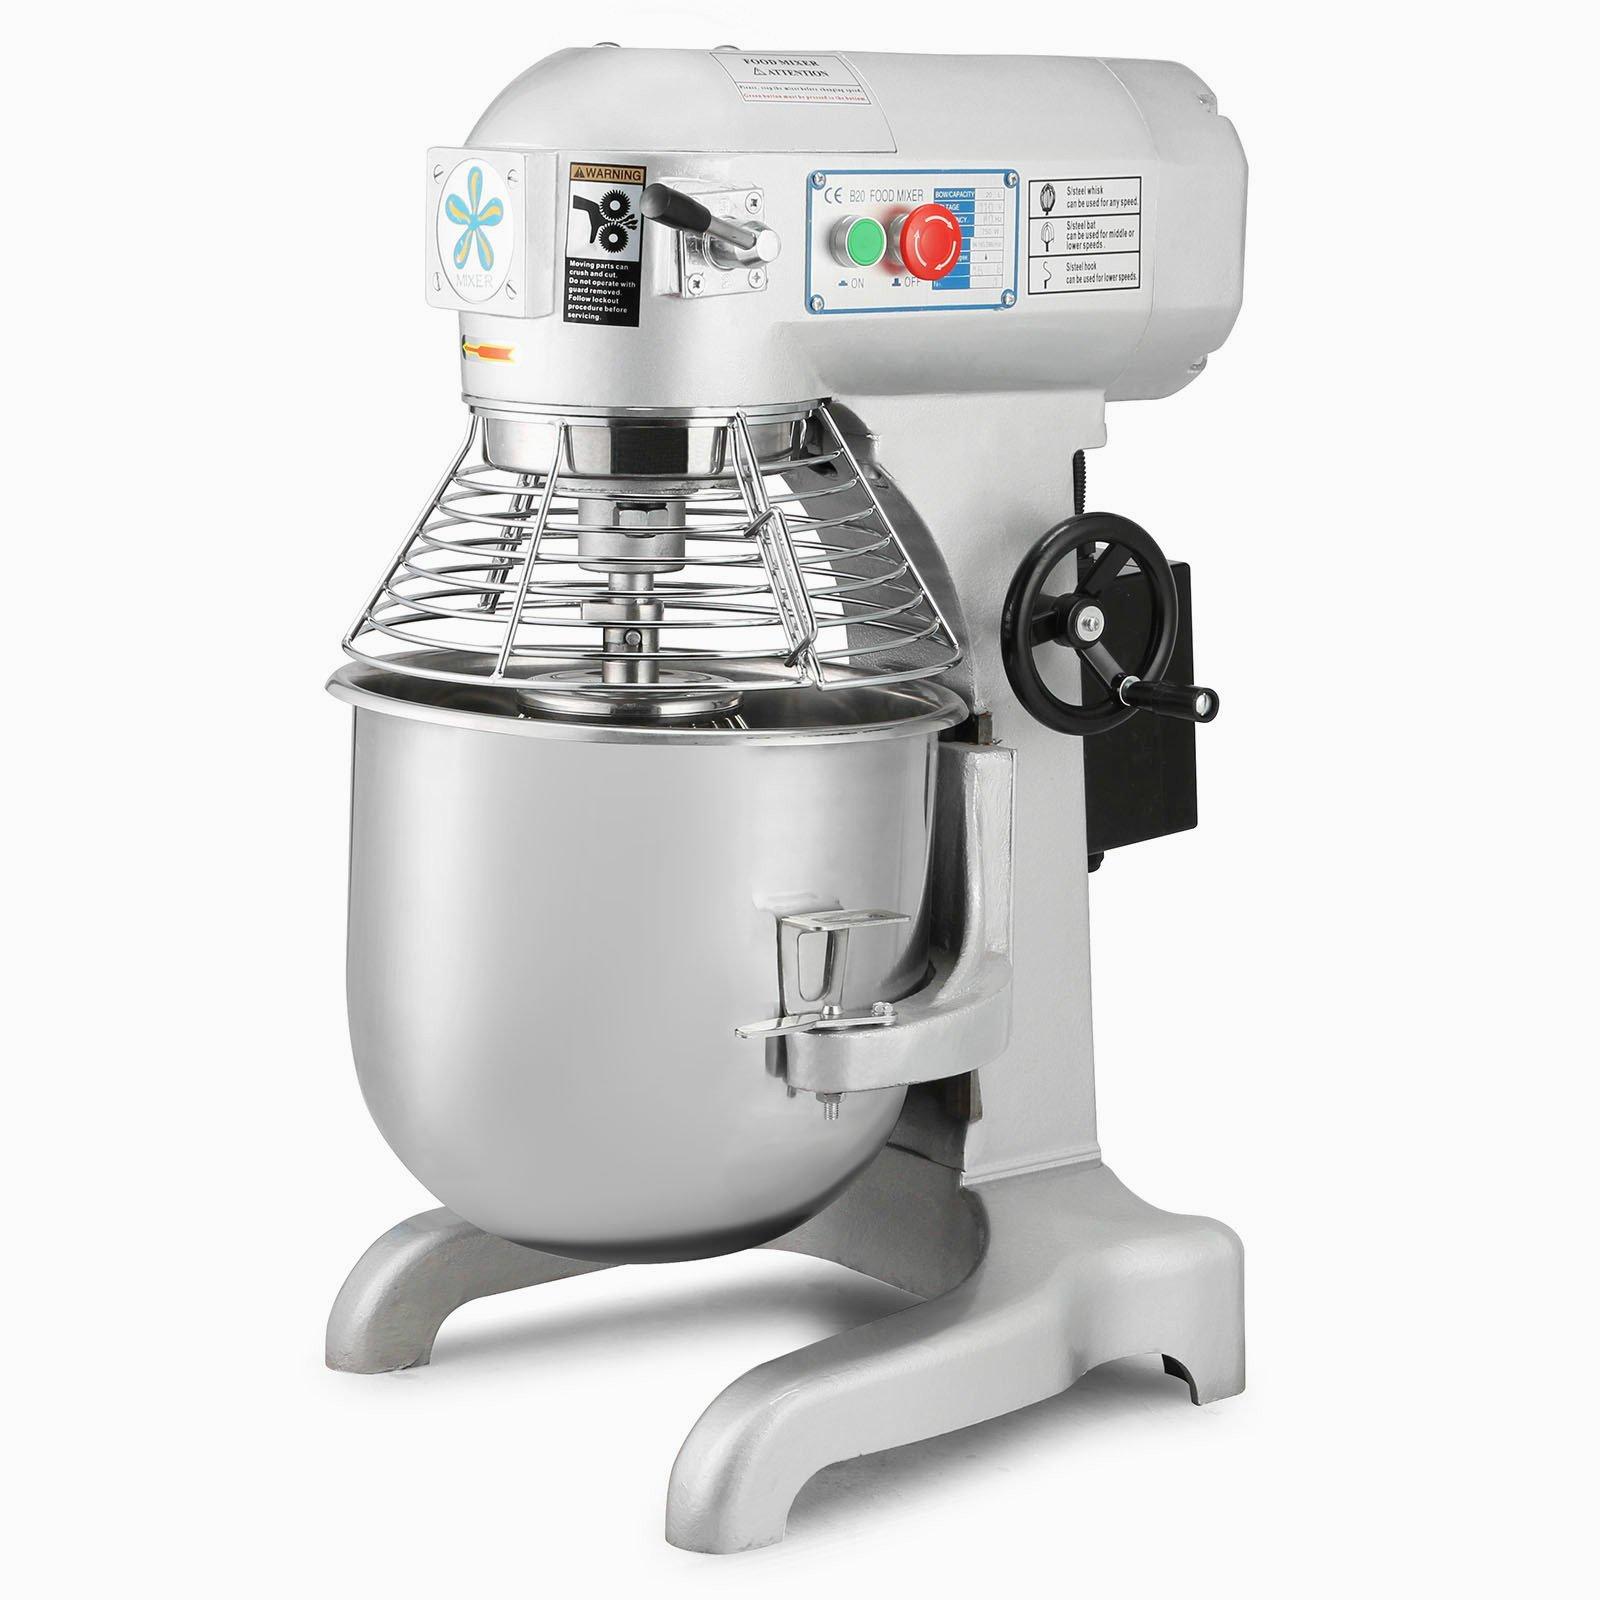 Forkwin Dough Mixer 750W Food Mixer 20L Dough Mixer Machine with 3 Speeds Adjustable Food Mixer Electric for Cream Cake Stuffing Dough